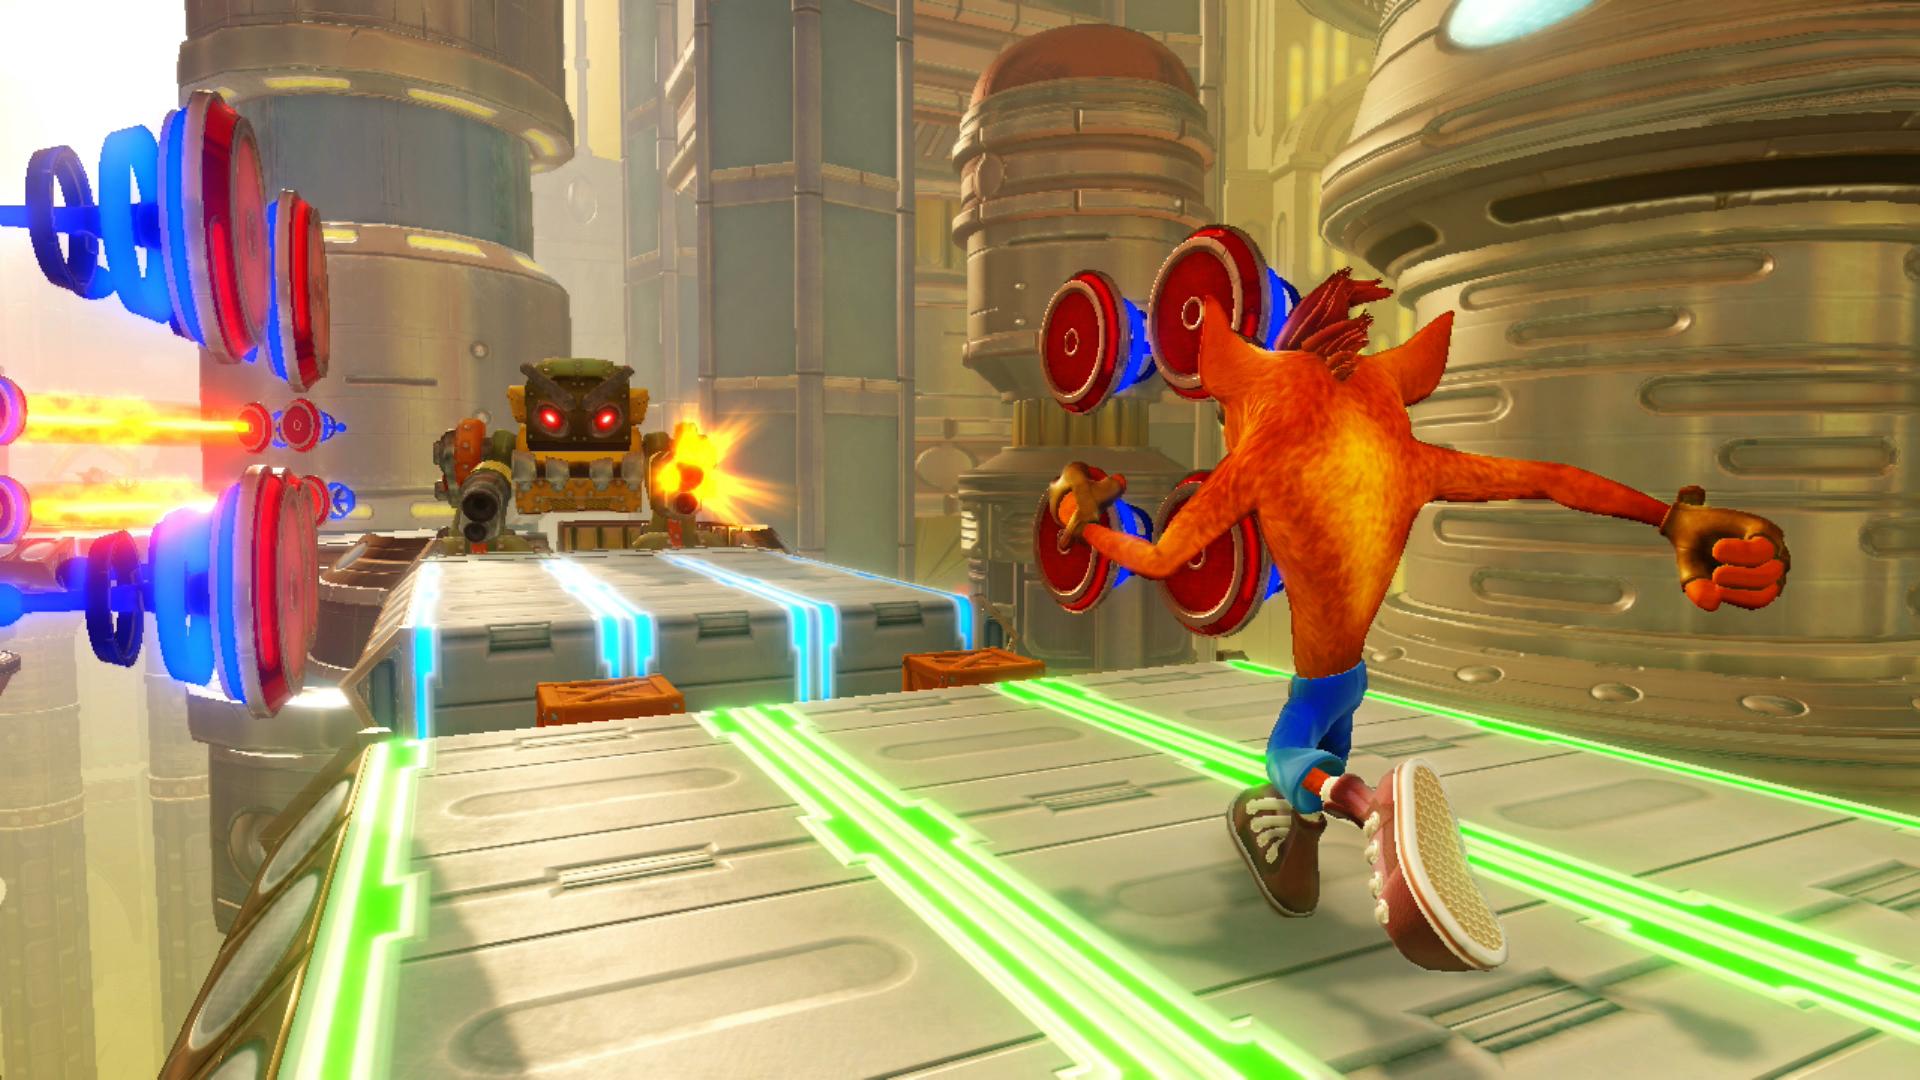 Review: Crash Bandicoot N. Sane Trilogy on the Nintendo Switch